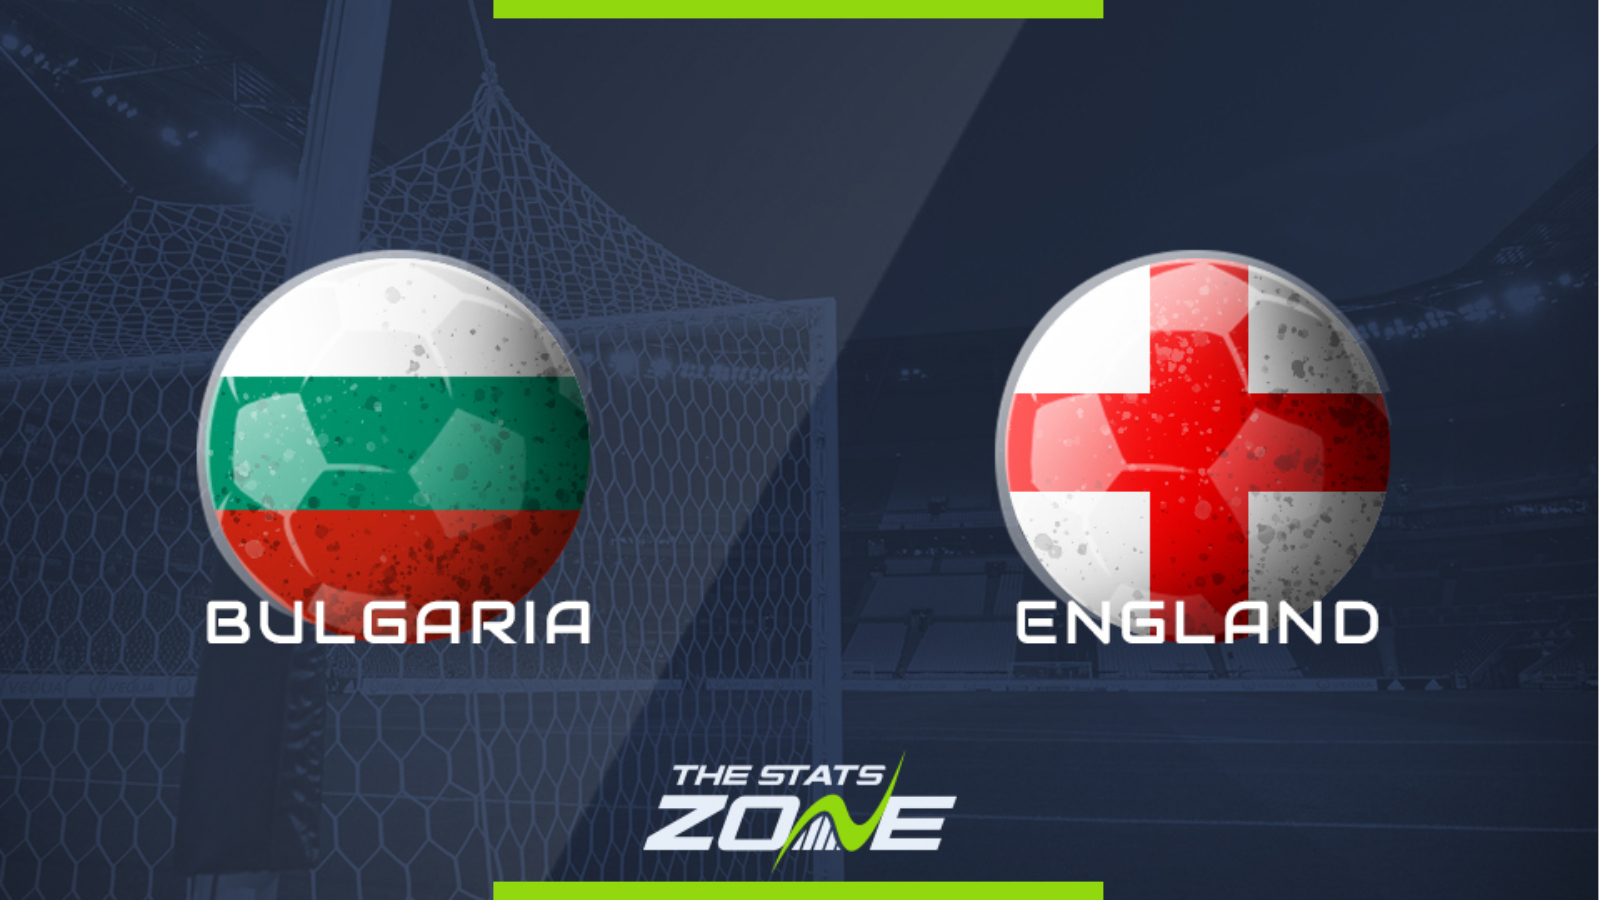 bulgaria vs england - photo #32